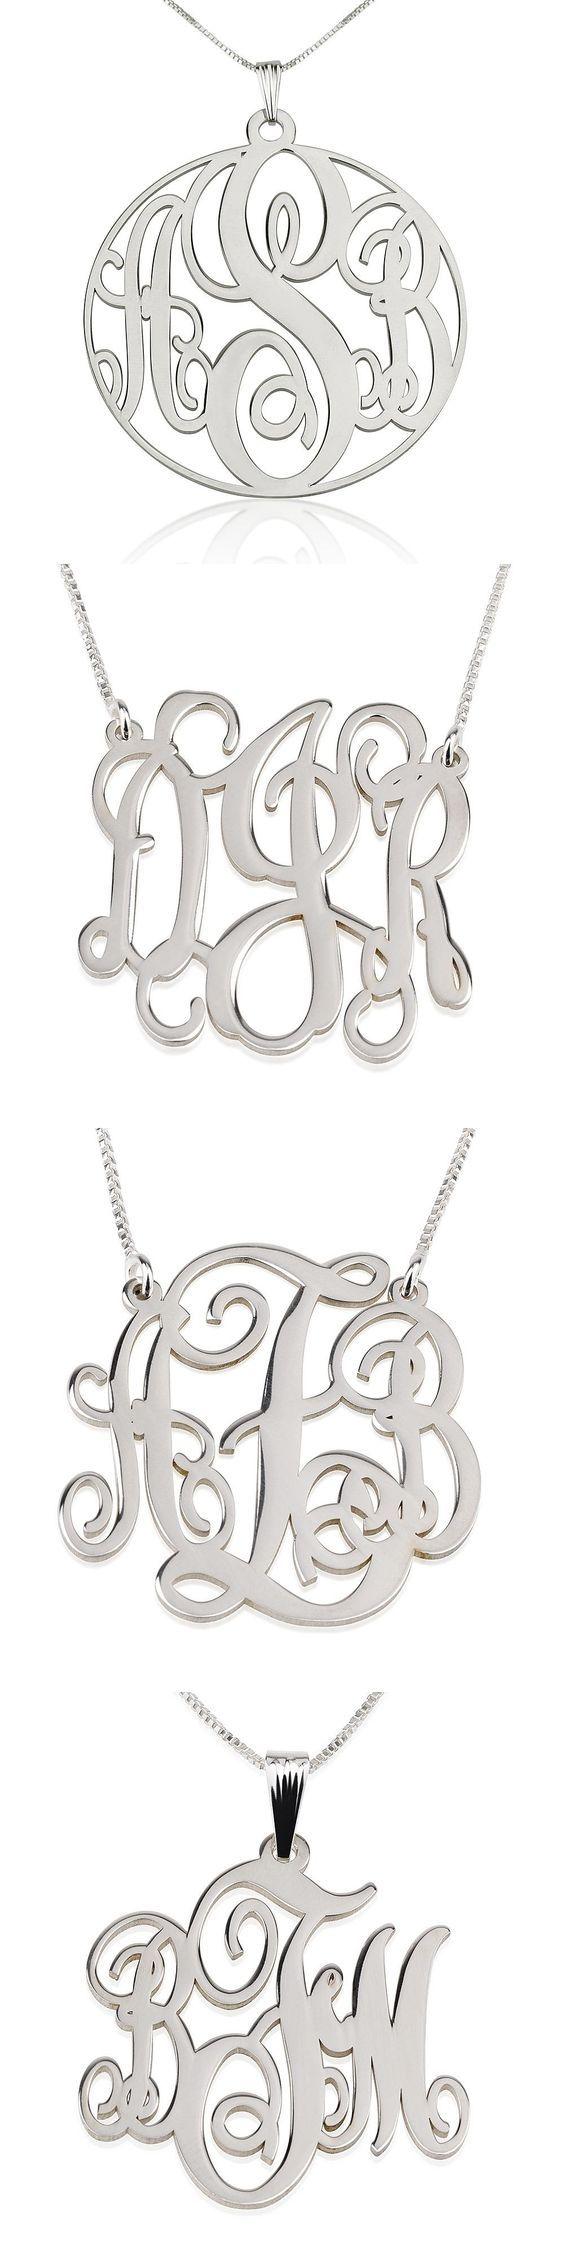 Sterling Silver Monogram Necklaces ✨